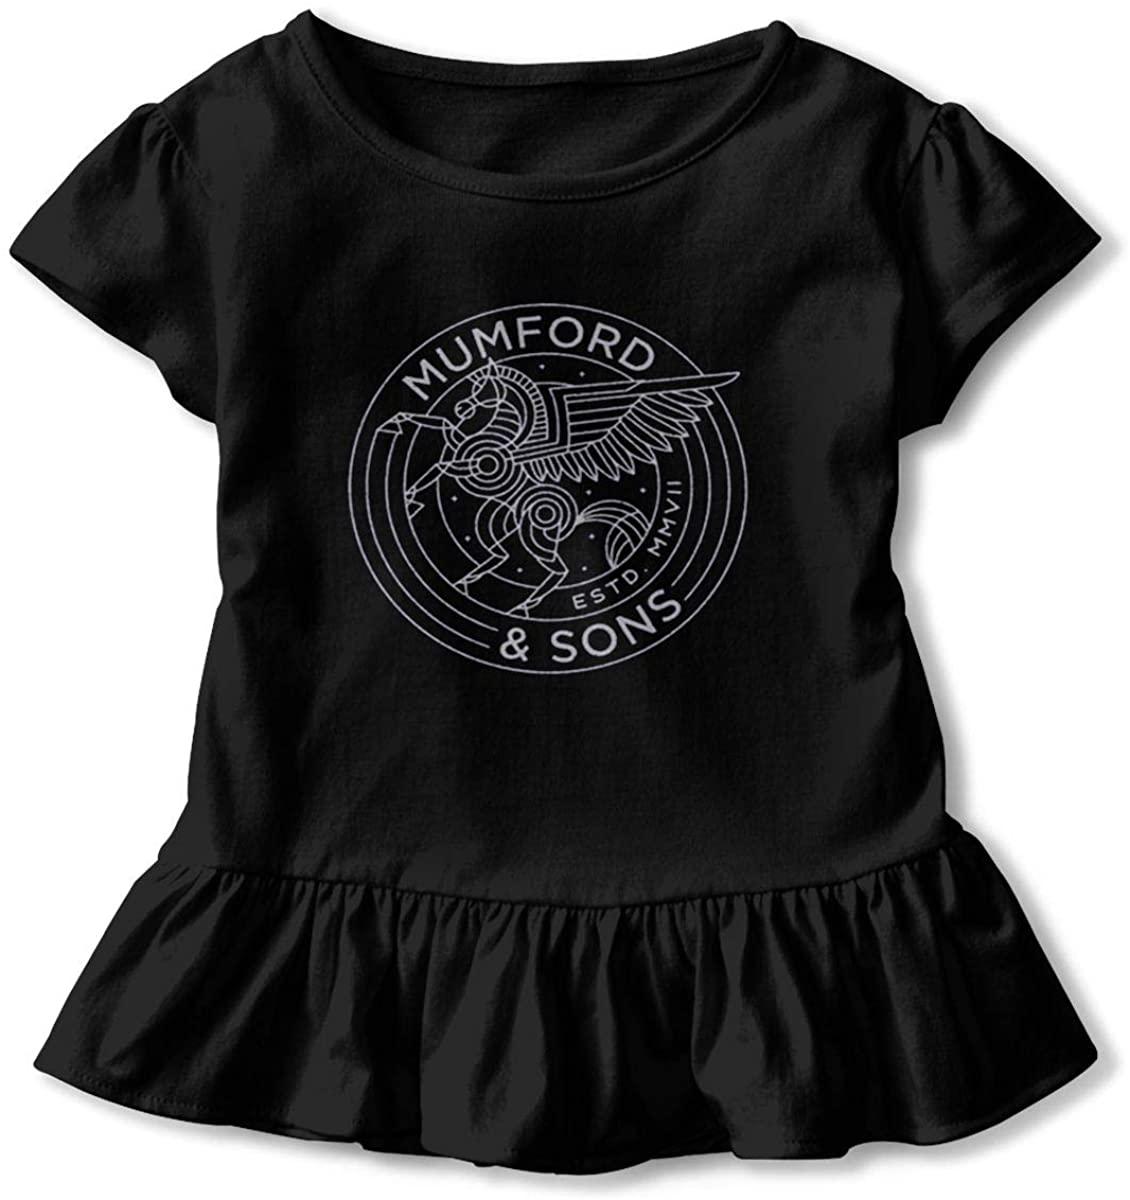 AP.Room Little Girls Cotton Casual Print Short Sleeve Skirt Mumford & Sons Dresses 2-6tblack